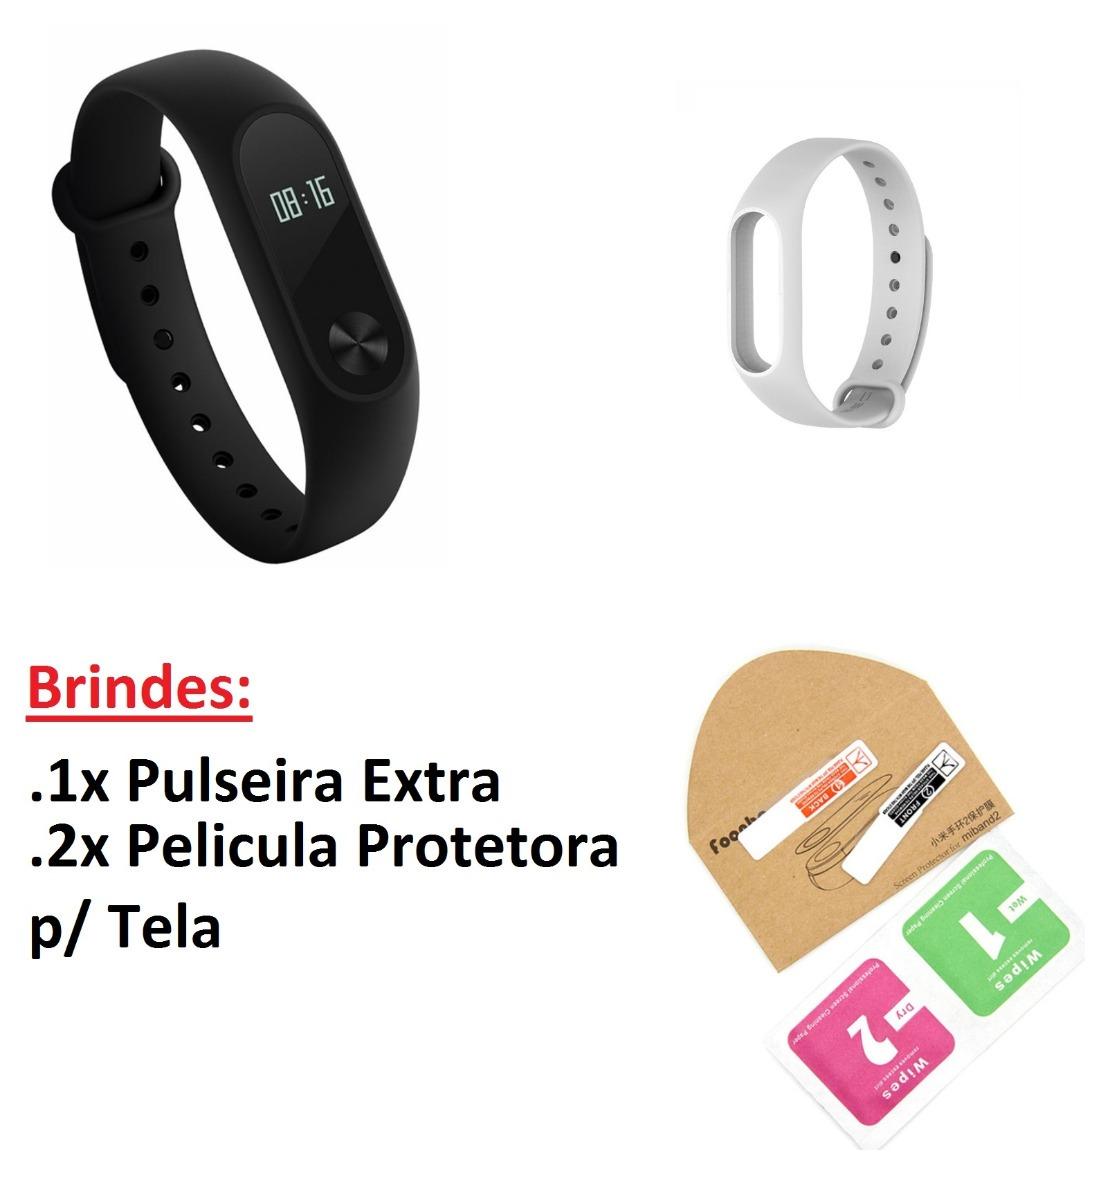 Xiaomi Mi Band 2 2x Peliculas 1x Pulseira Extra Brinde R 139 Bonus Screen Guard Carregando Zoom